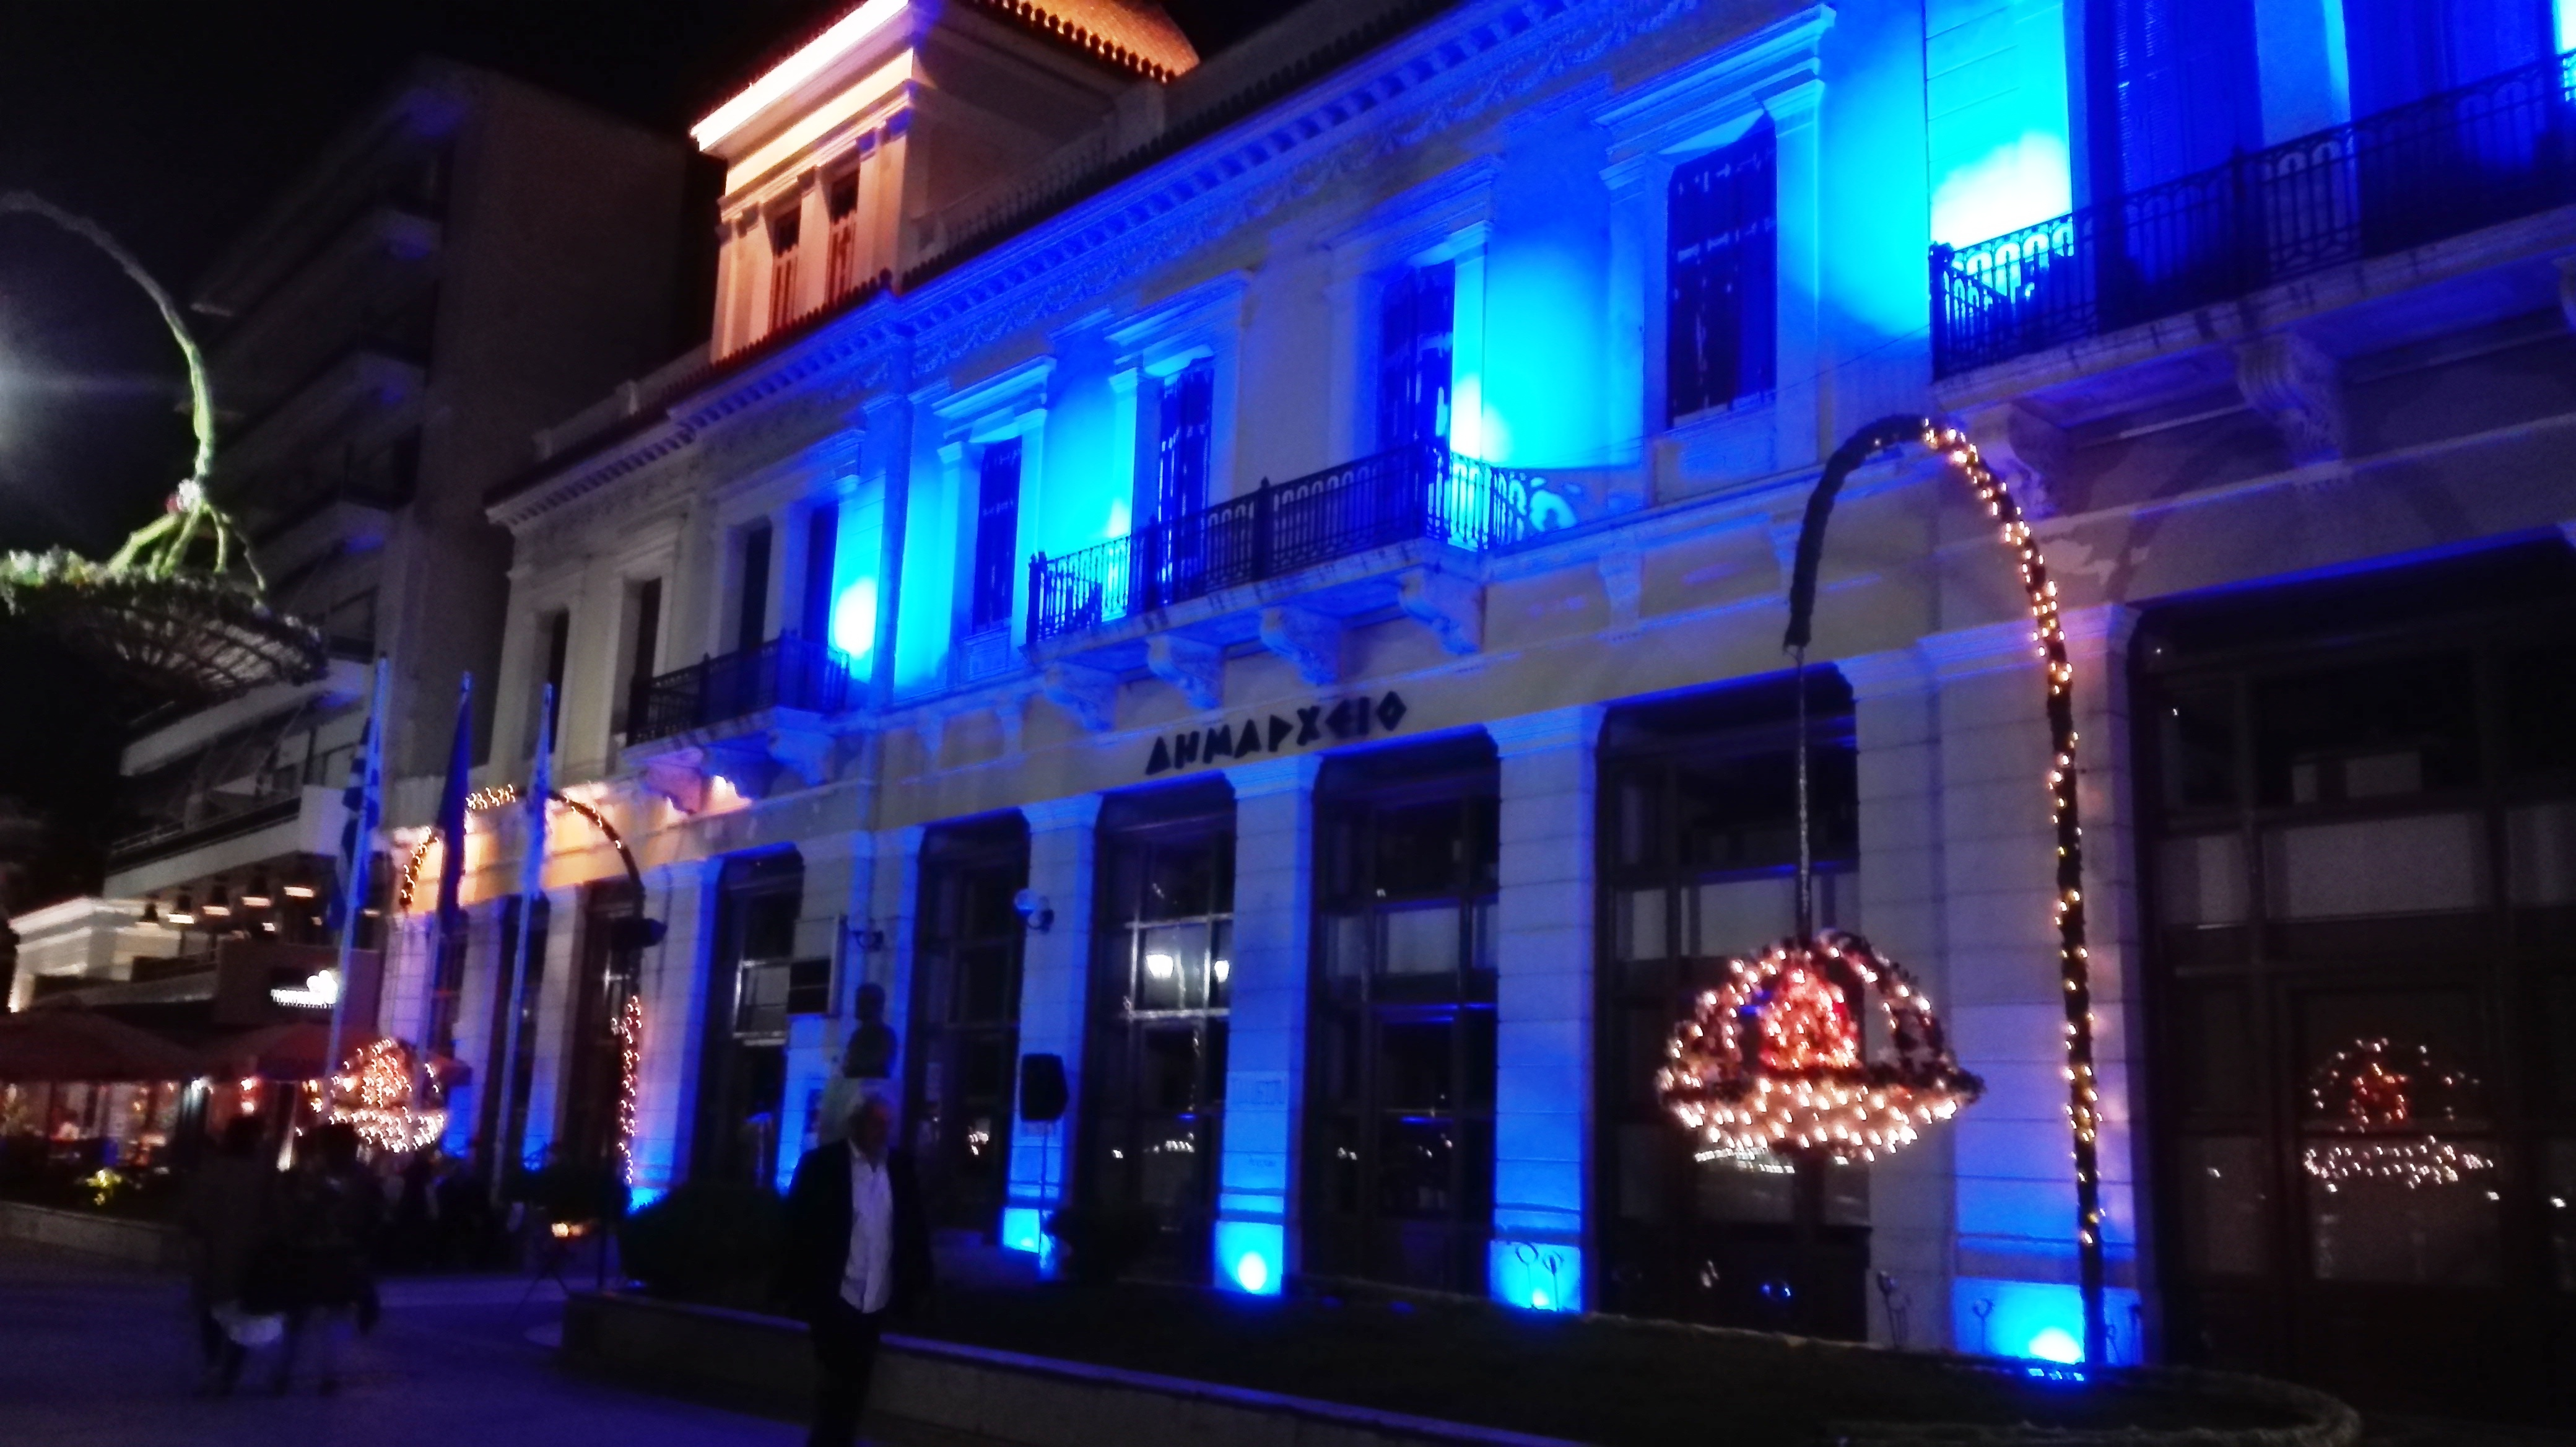 LIGHT IT UP BLUE από το Ειδικό Νηπιαγωγείο Χαλκίδας στο κτήριο του Δημαρχείου.